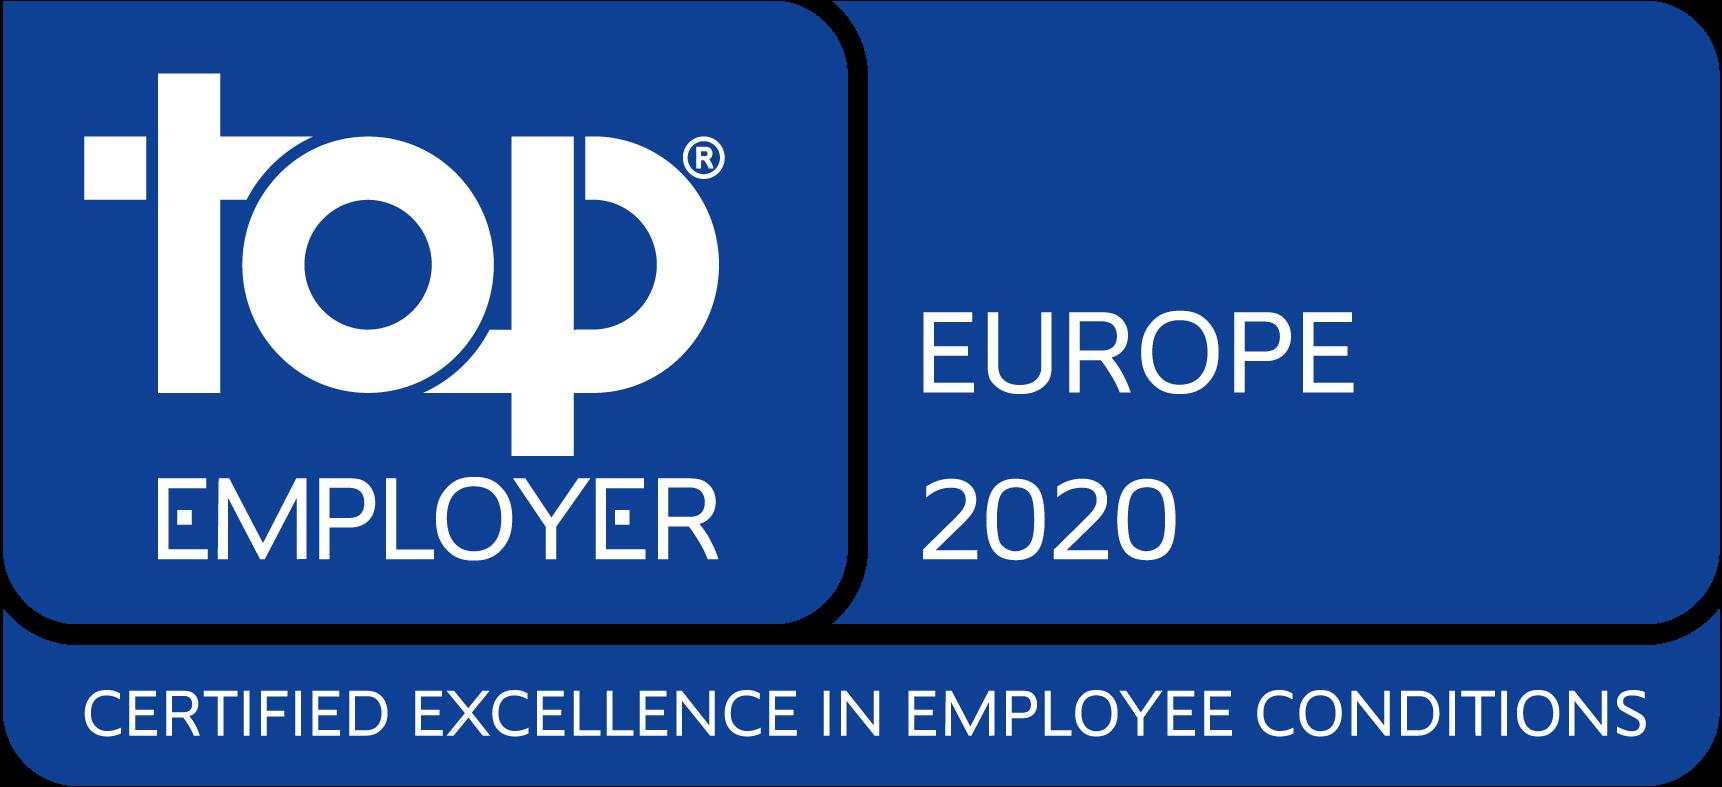 Top_Employer_Europe_2020